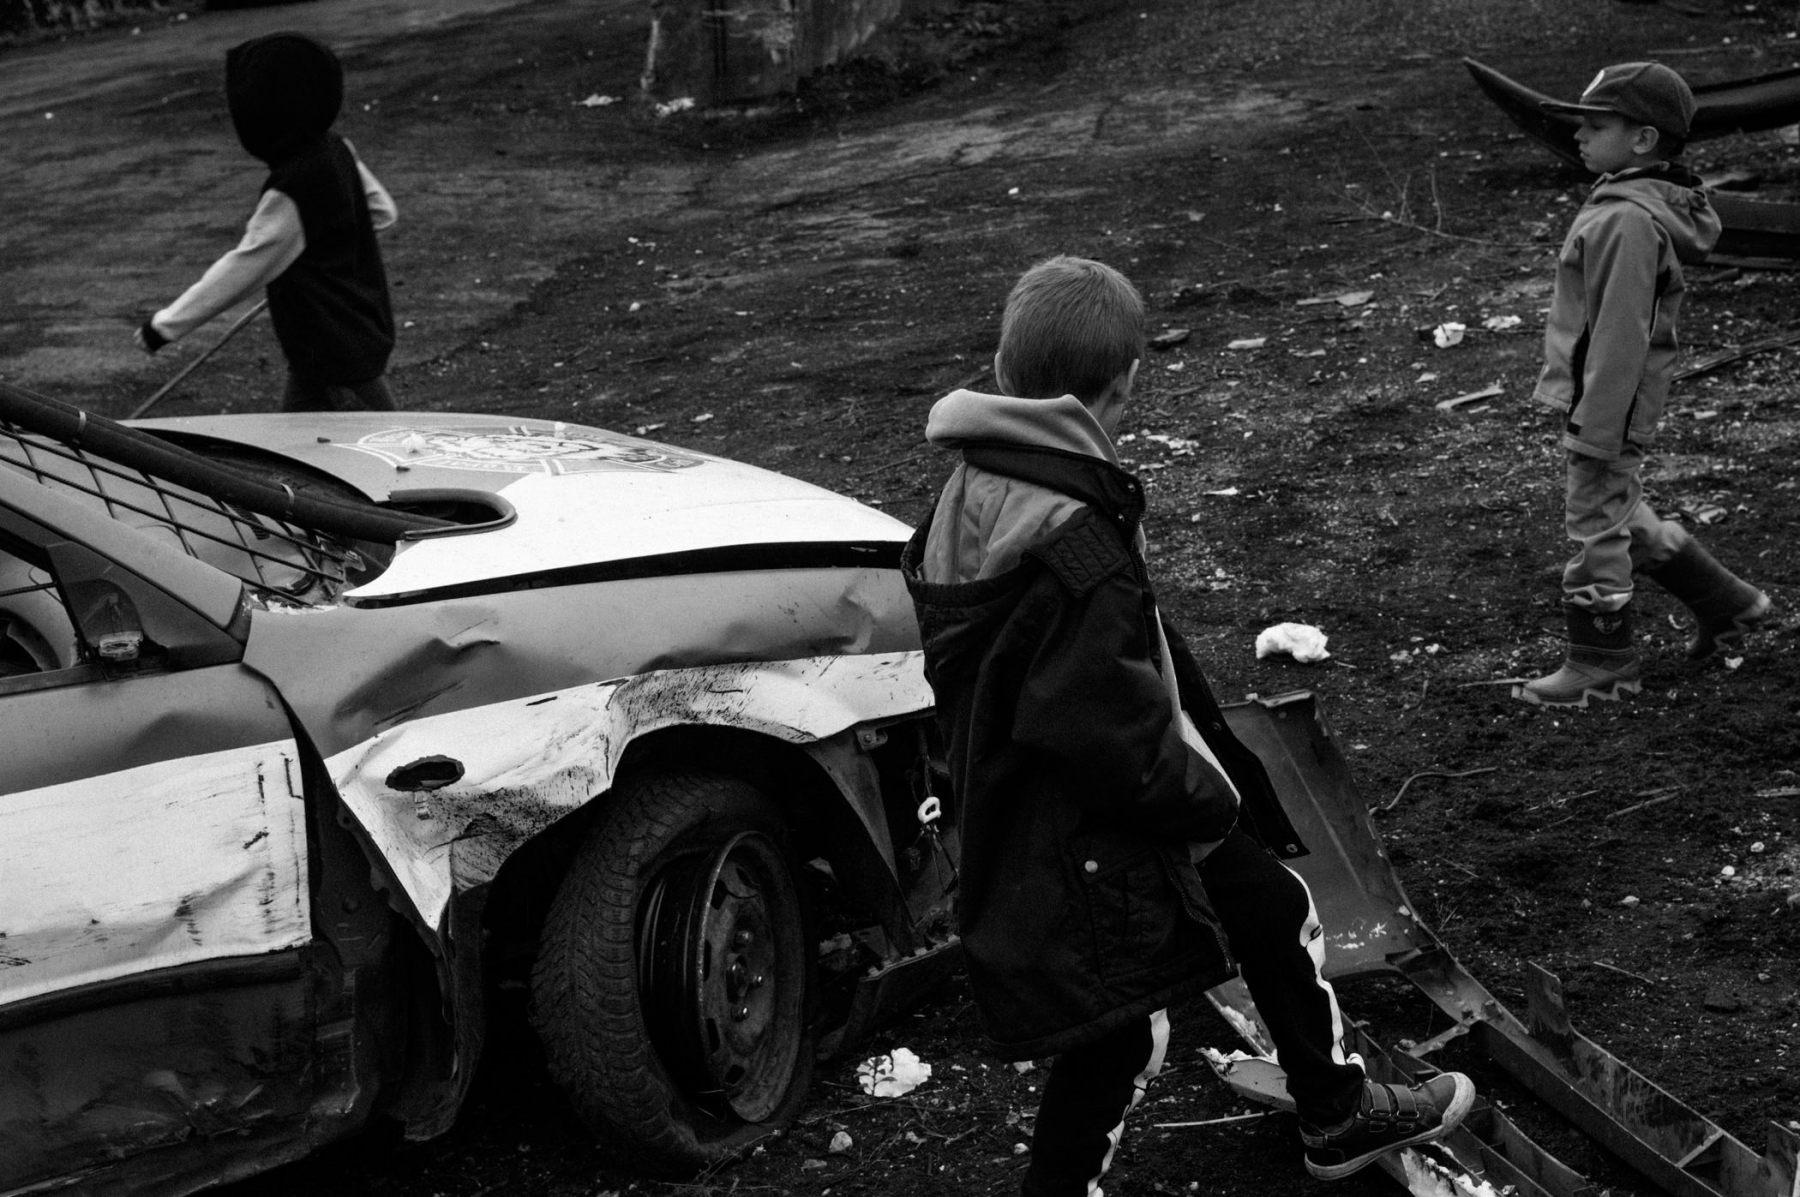 kevin_v_ton_Crash-Cars_13